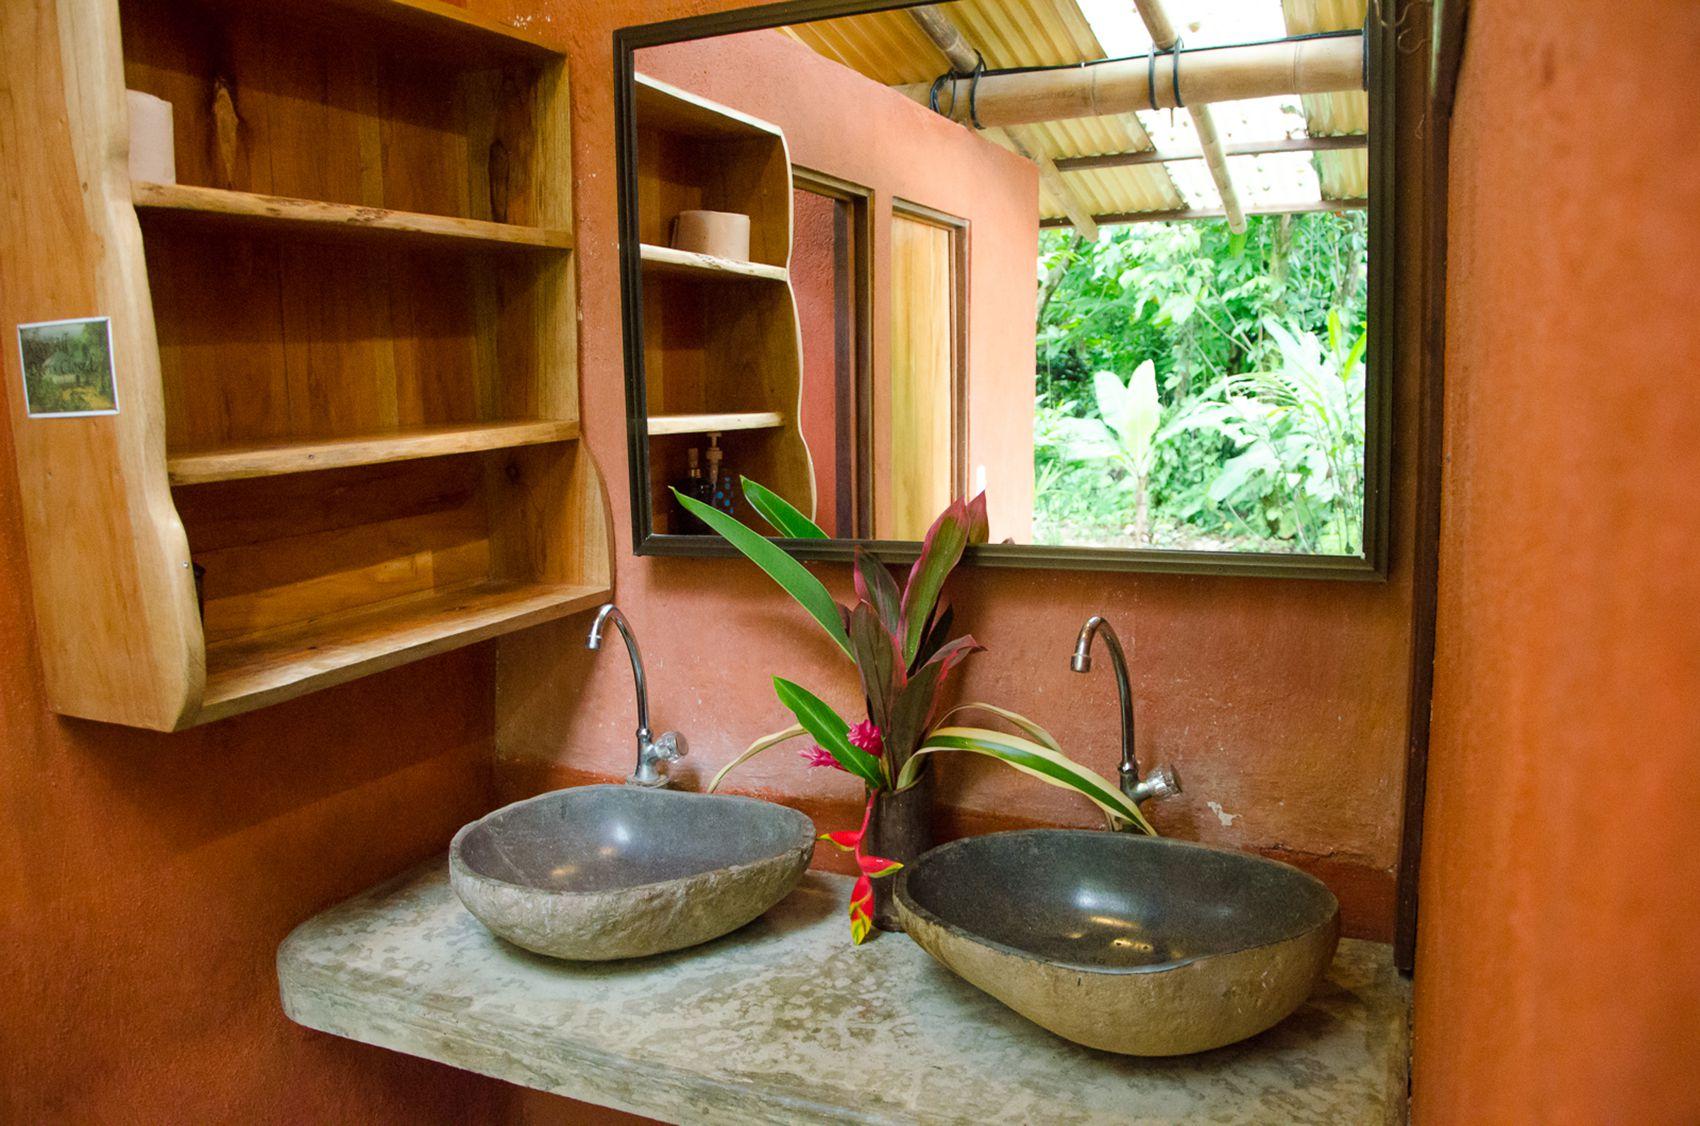 retreat_selva-armonia_yoga-november_2015-bathroom_sinks.jpg